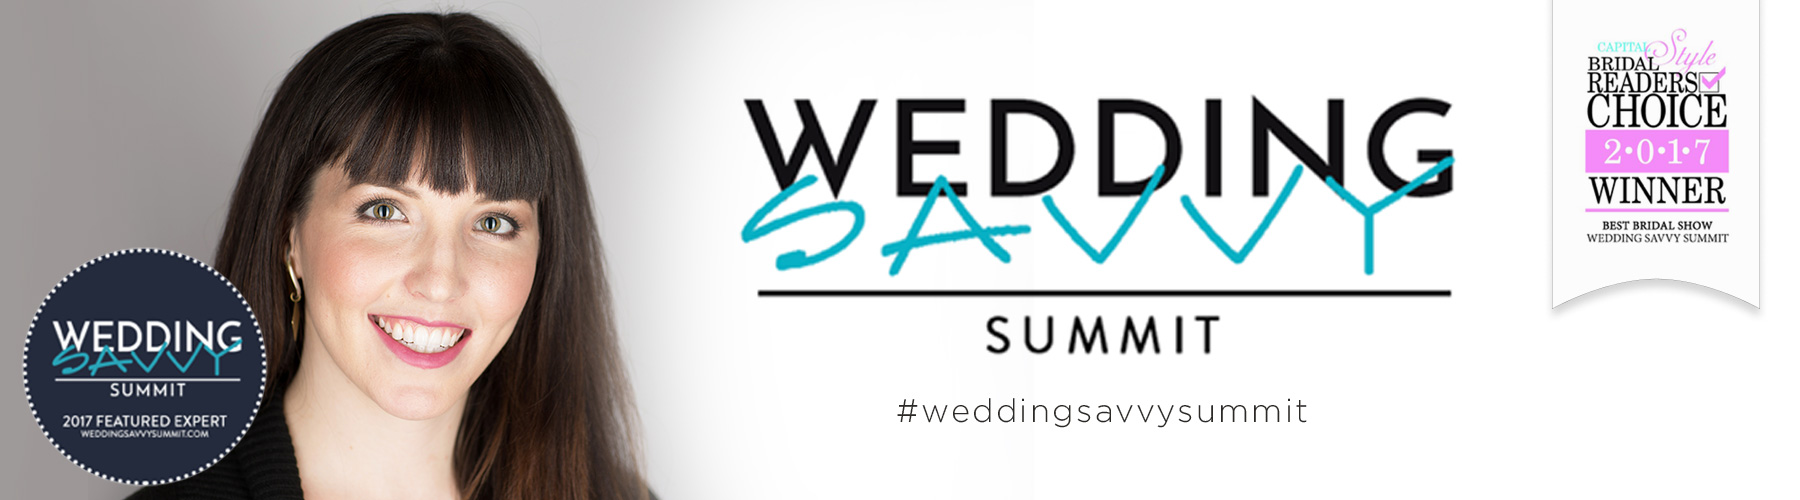 Type-A-Invitations-Wedding-Savvy-Header-1800x500_020817.jpg